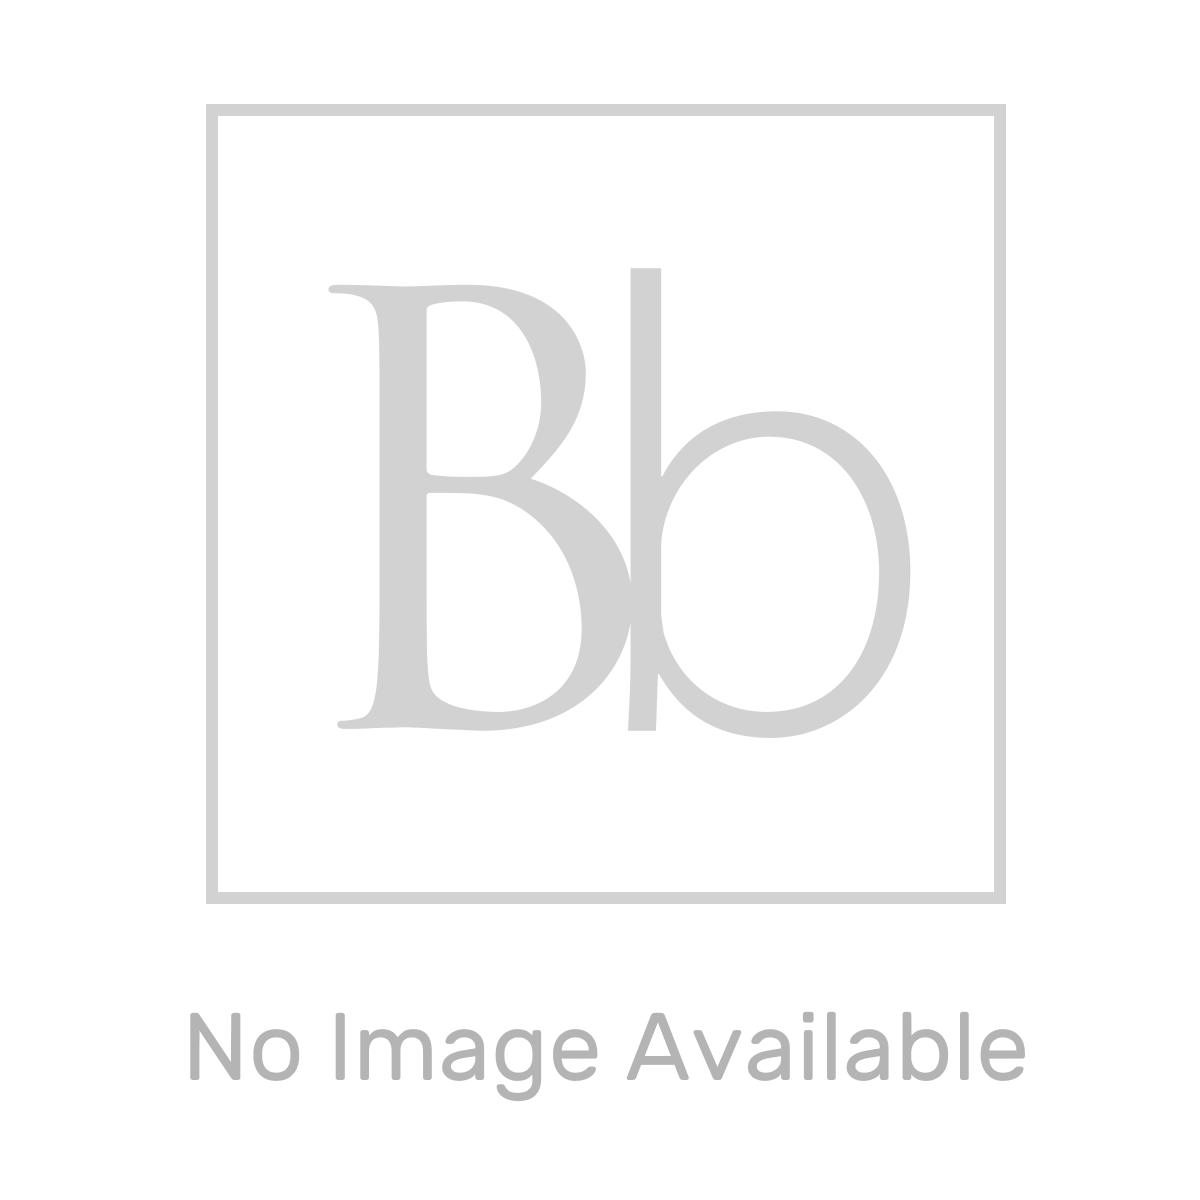 RAK Washington Grey Freestanding Bath 1560mm Measurements